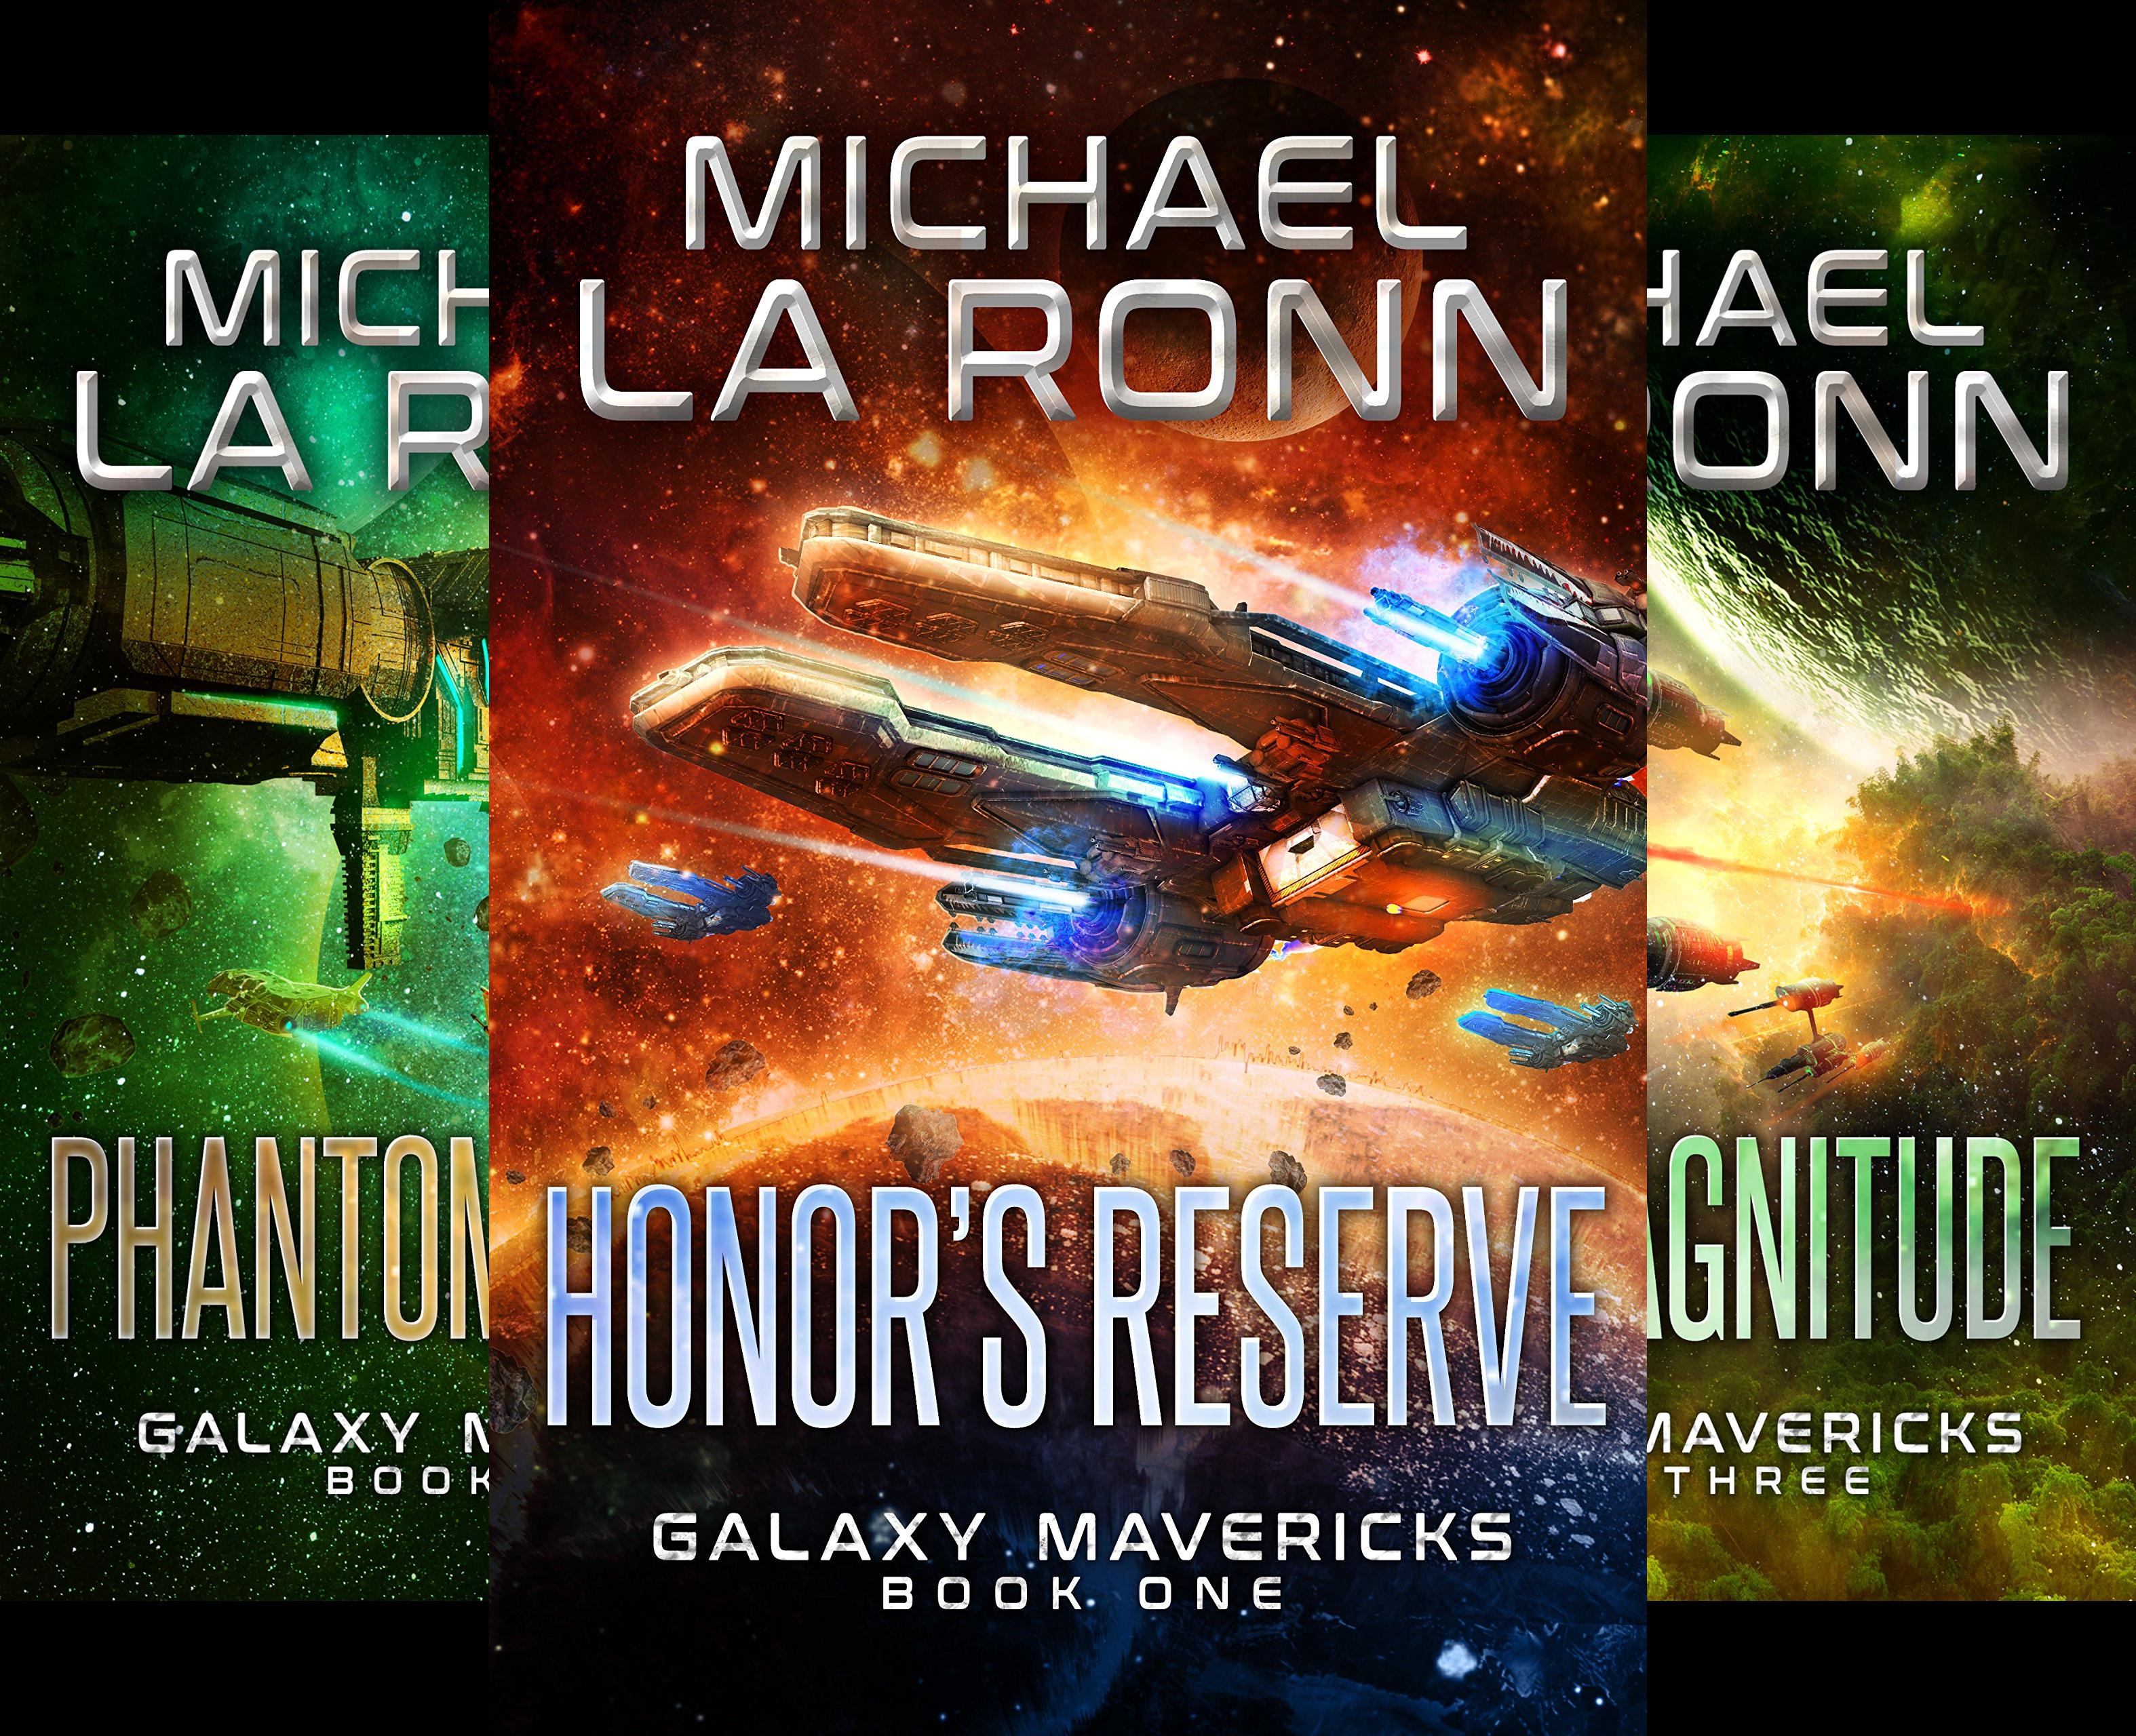 Galaxy Mavericks (7 Book Series)